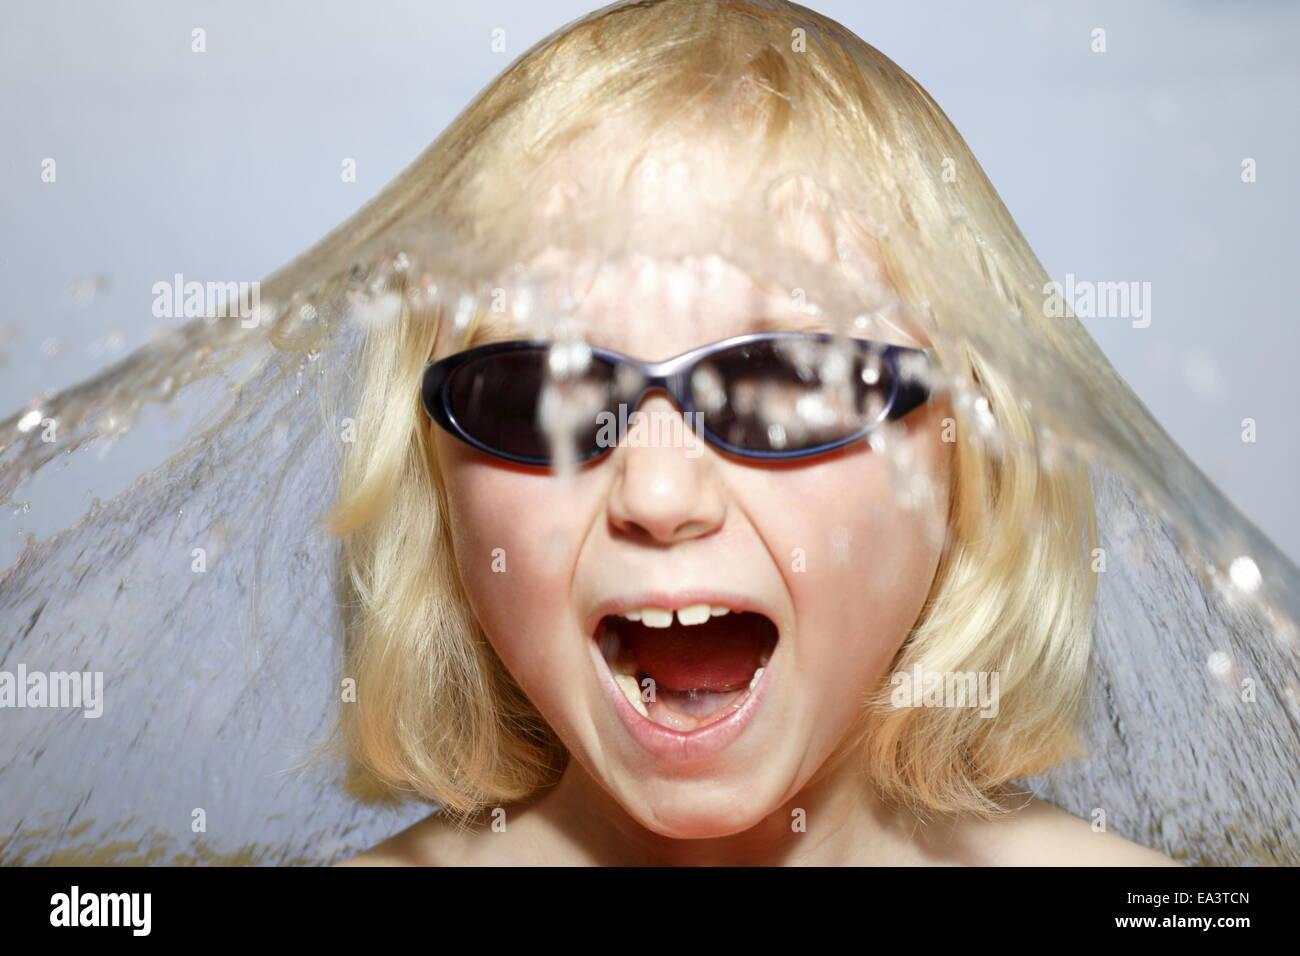 bathing fun - Stock Image